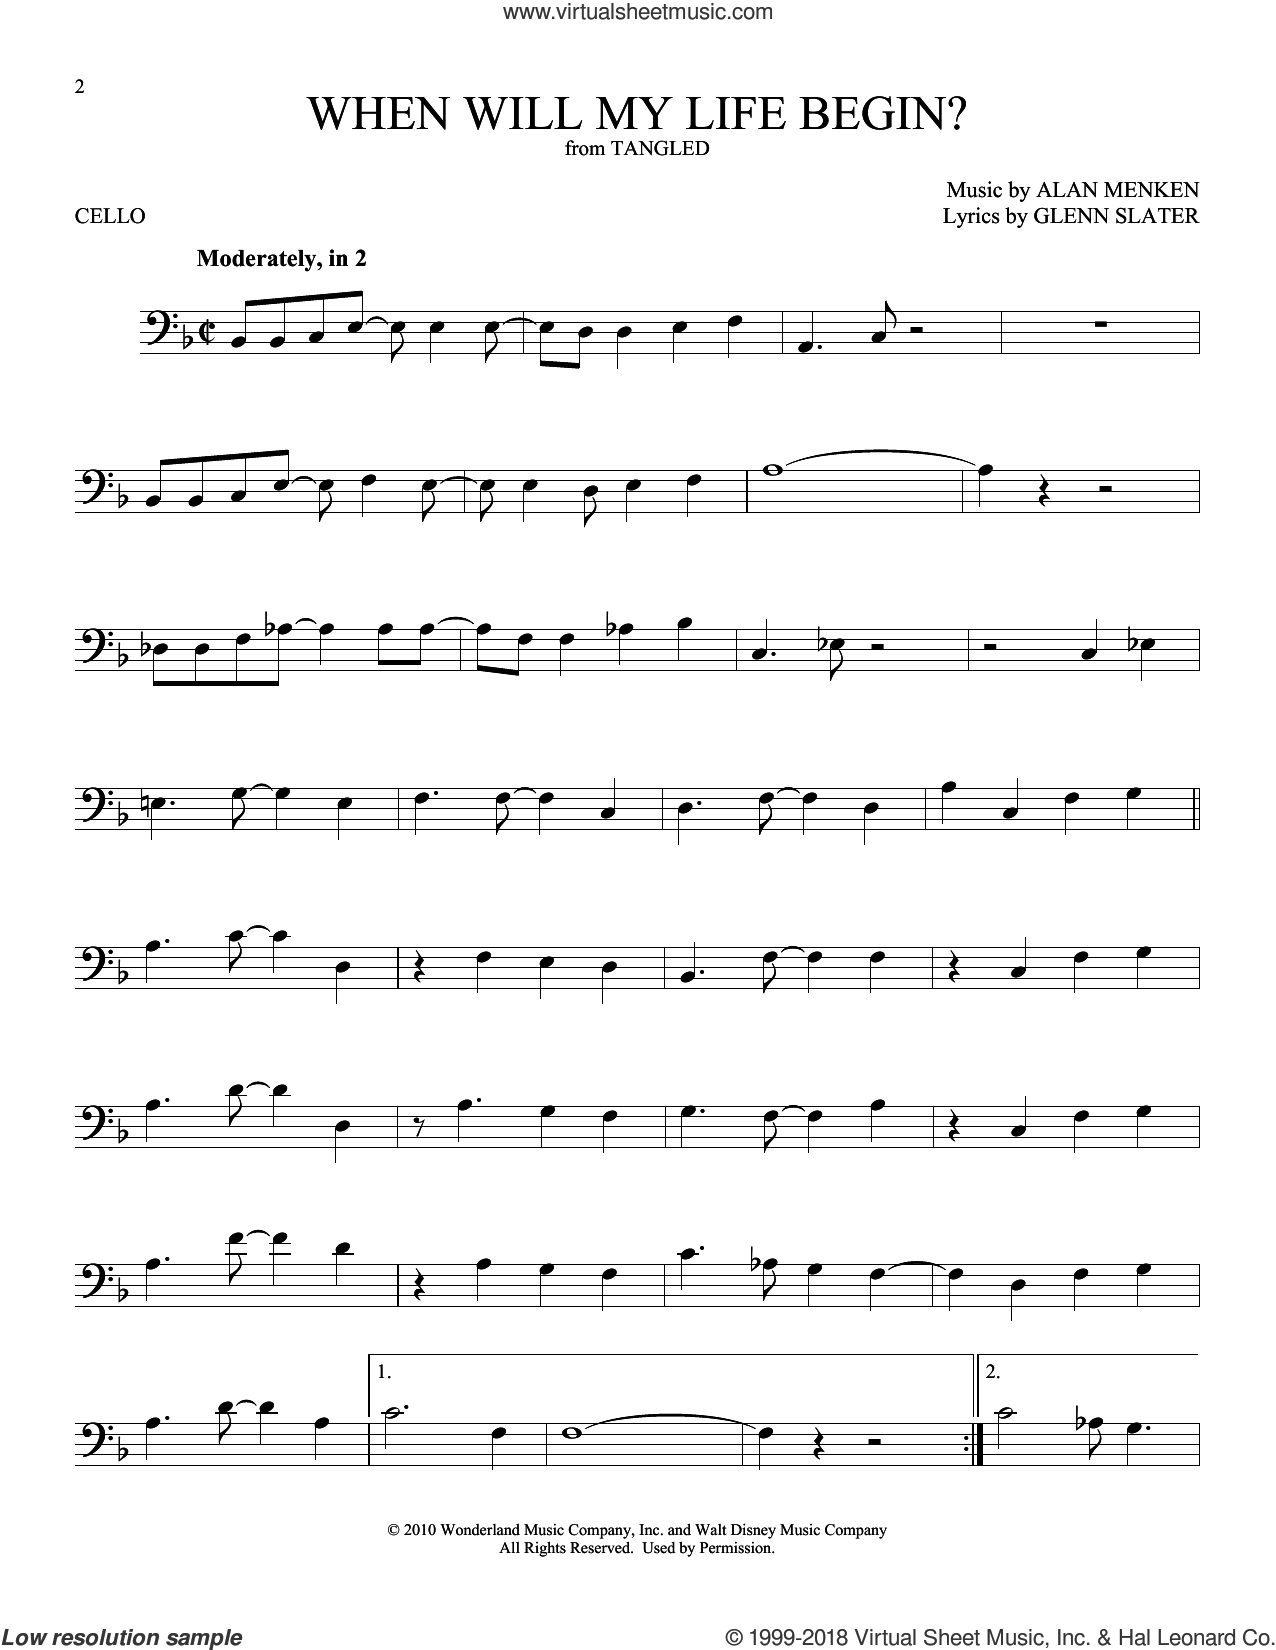 When Will My Life Begin? (from Disney's Tangled) sheet music for cello solo by Mandy Moore, Alan Menken and Glenn Slater, intermediate skill level